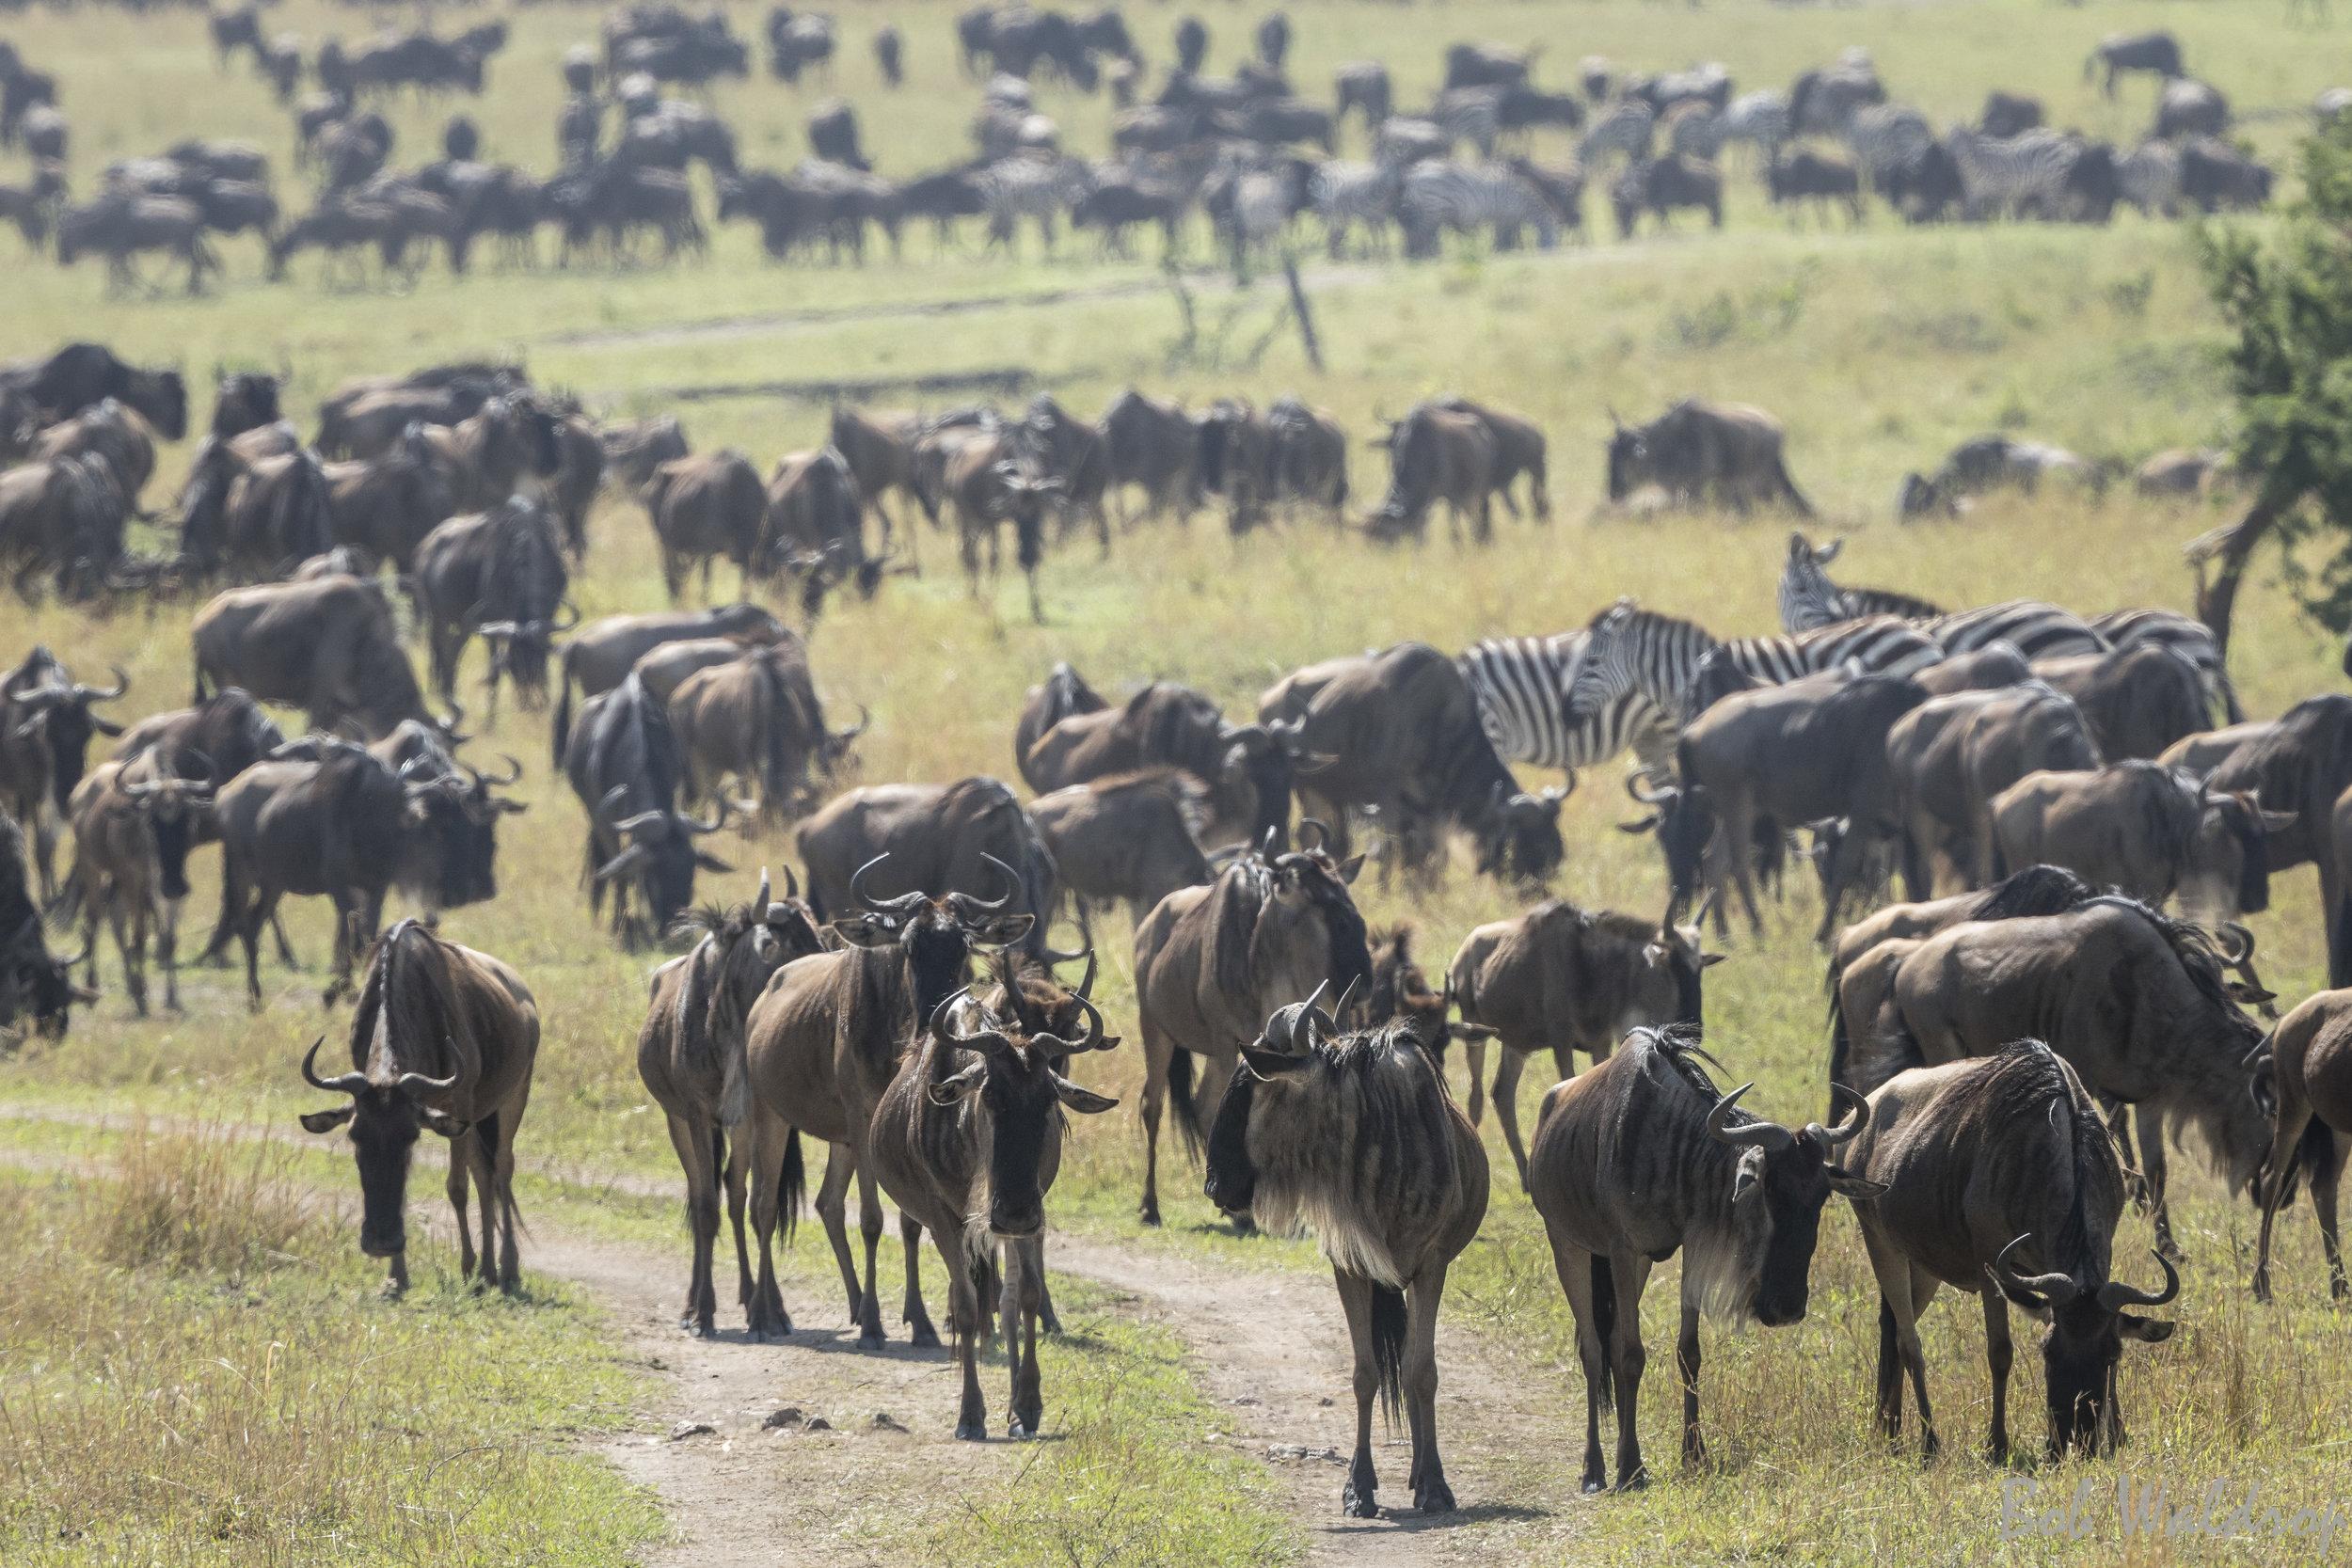 Serengeti-1626.JPG